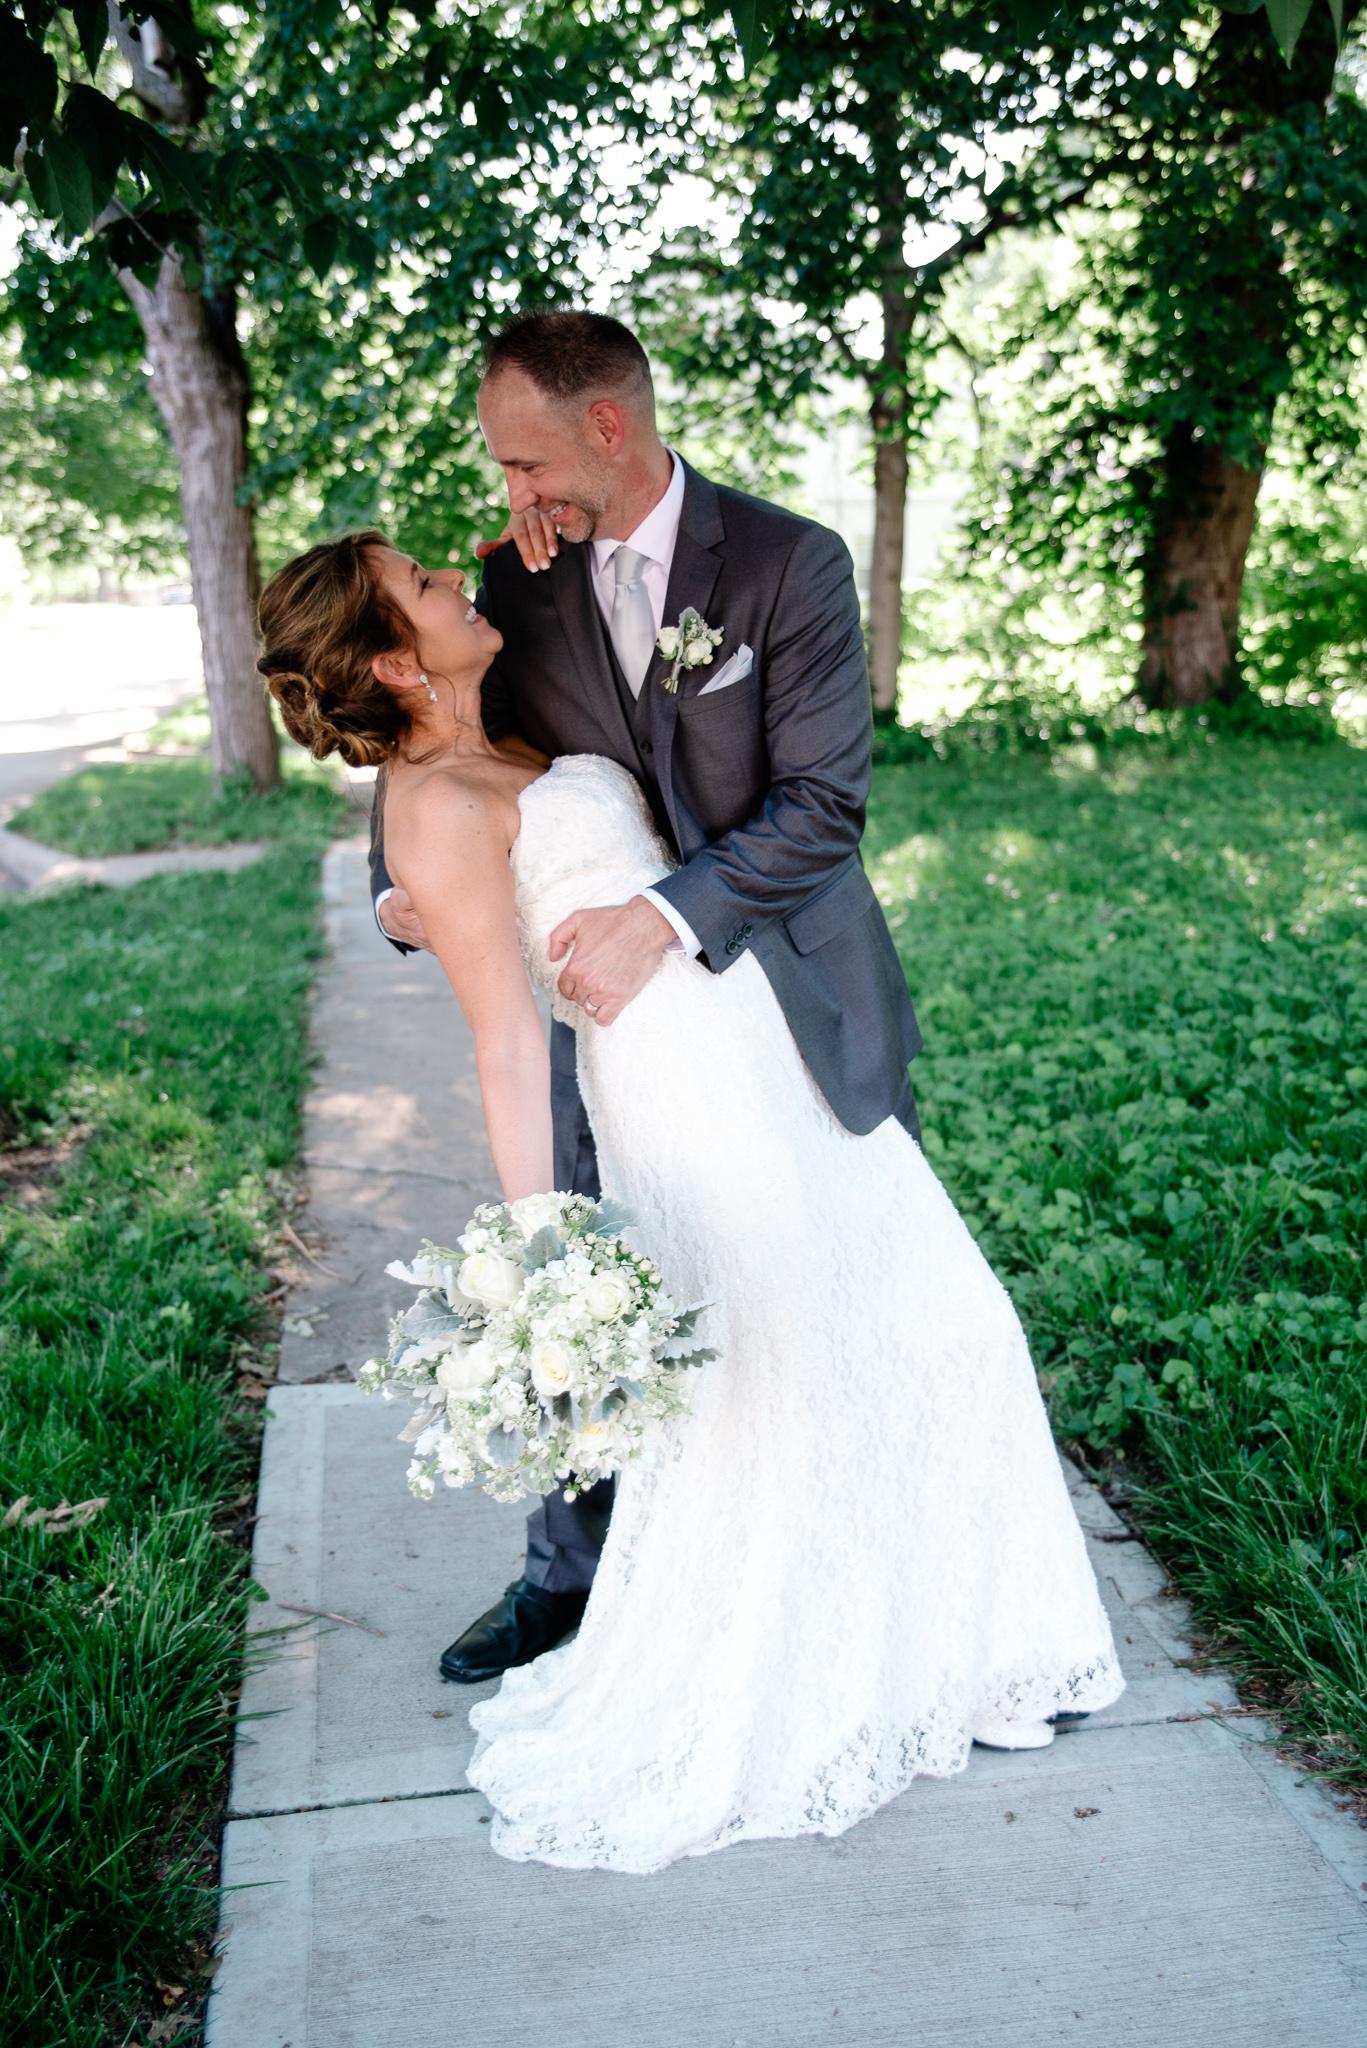 Real_Wedding_Small_Venue_Kansas_City_Chapel_on_the_Corner_DSC_5597-2.jpg